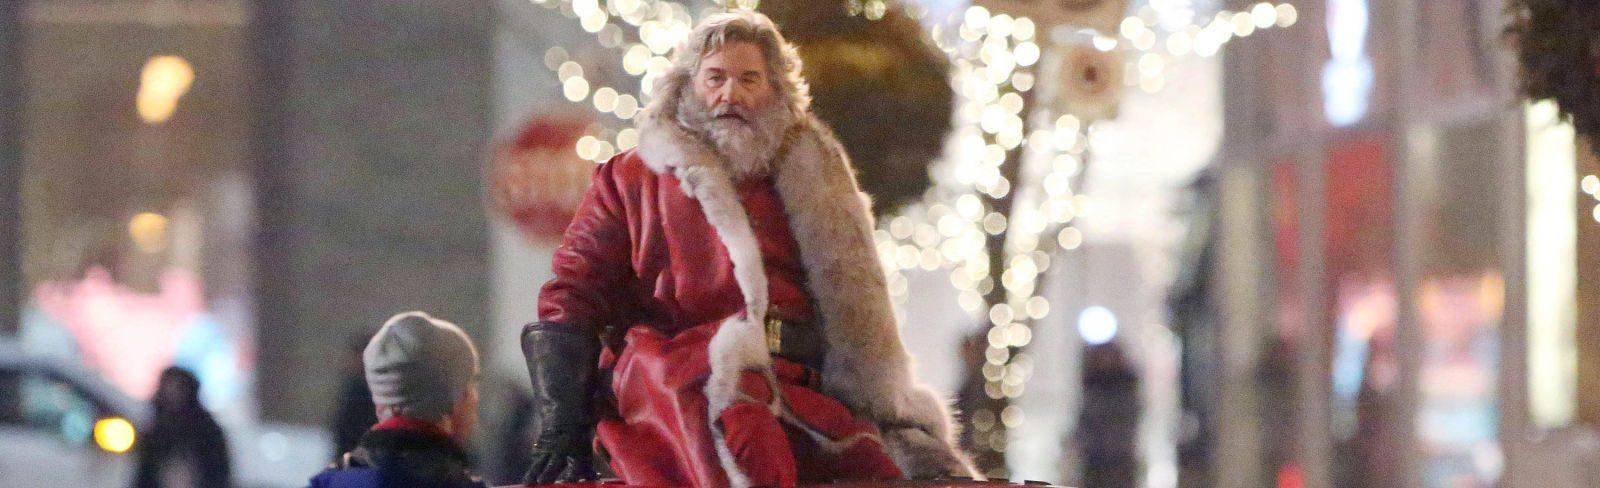 The Christmas Chronicles Santa.The Christmas Chronicles Trailer Kurt Russell Is Santa